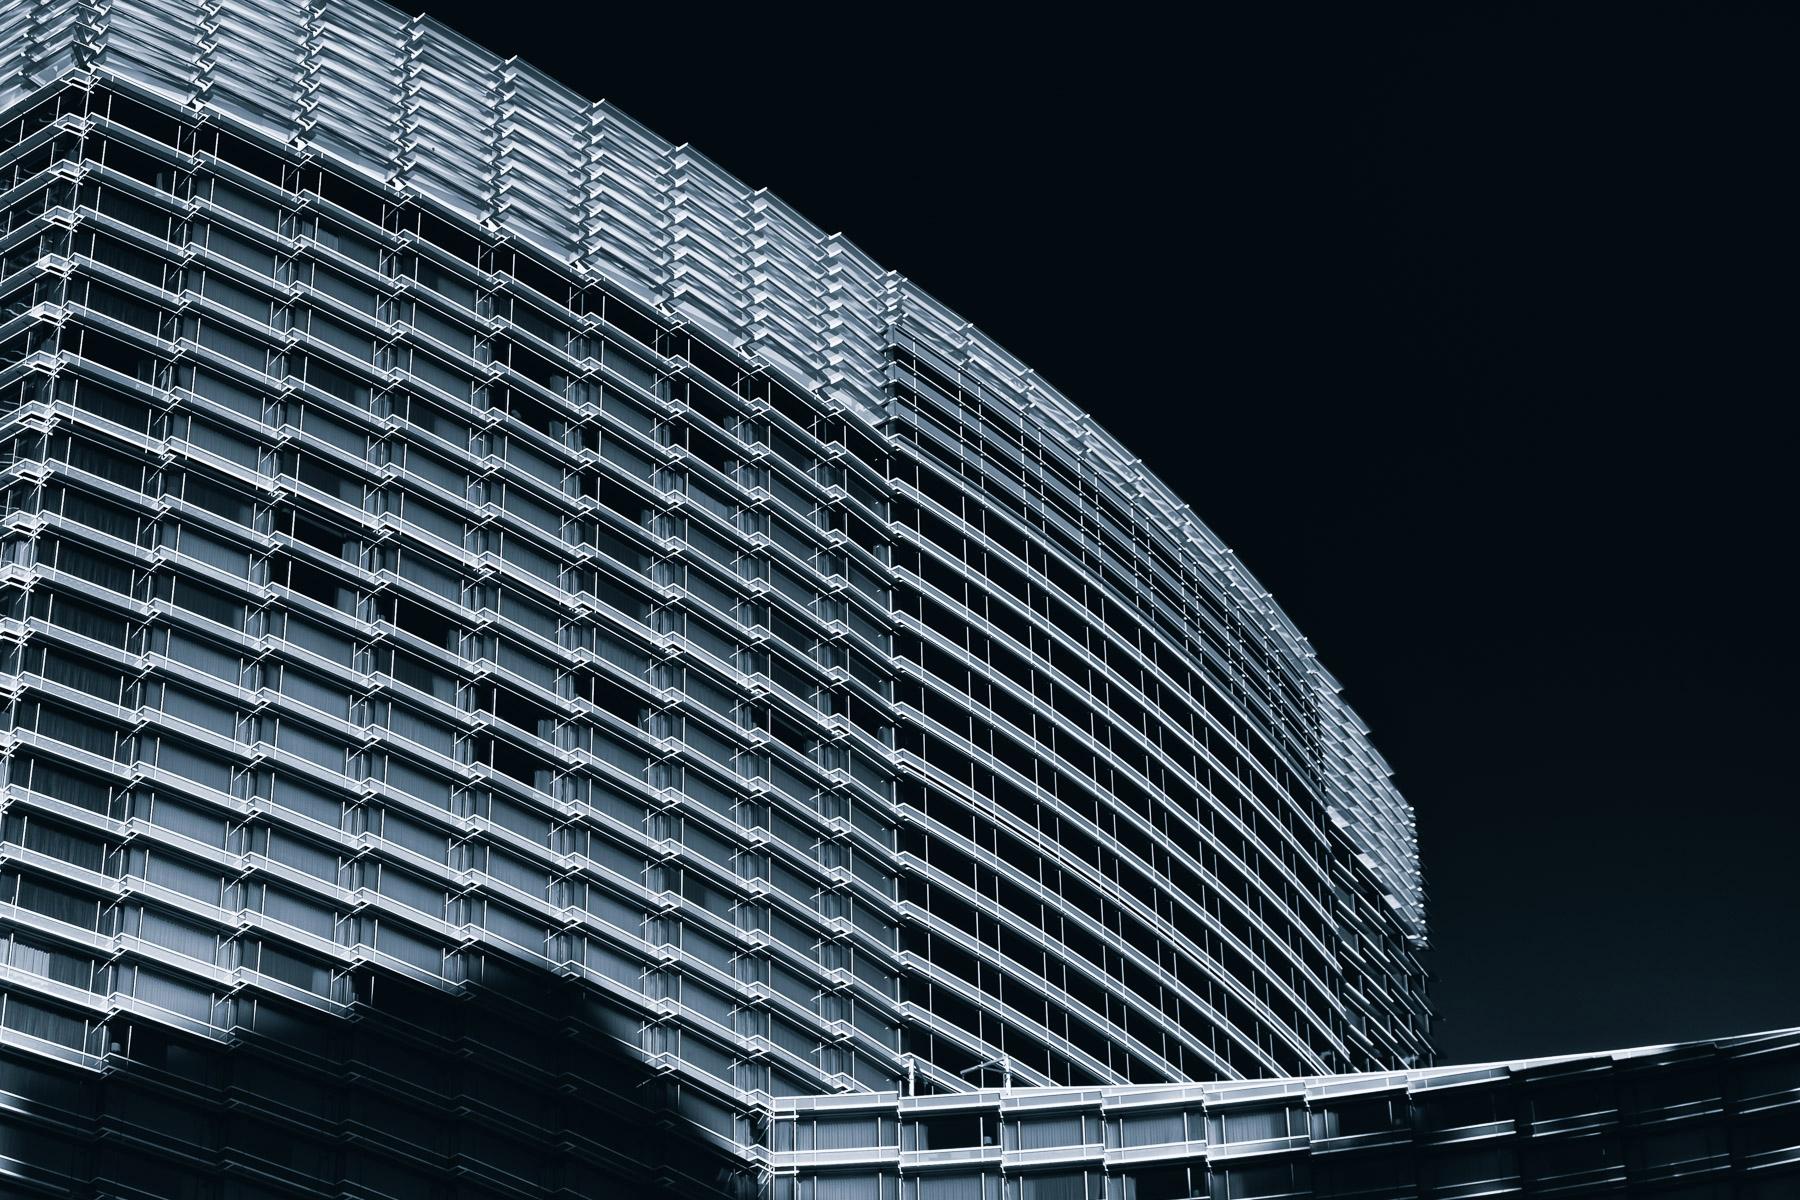 Glass Monolith windowed facade  - mattgharvey | ello